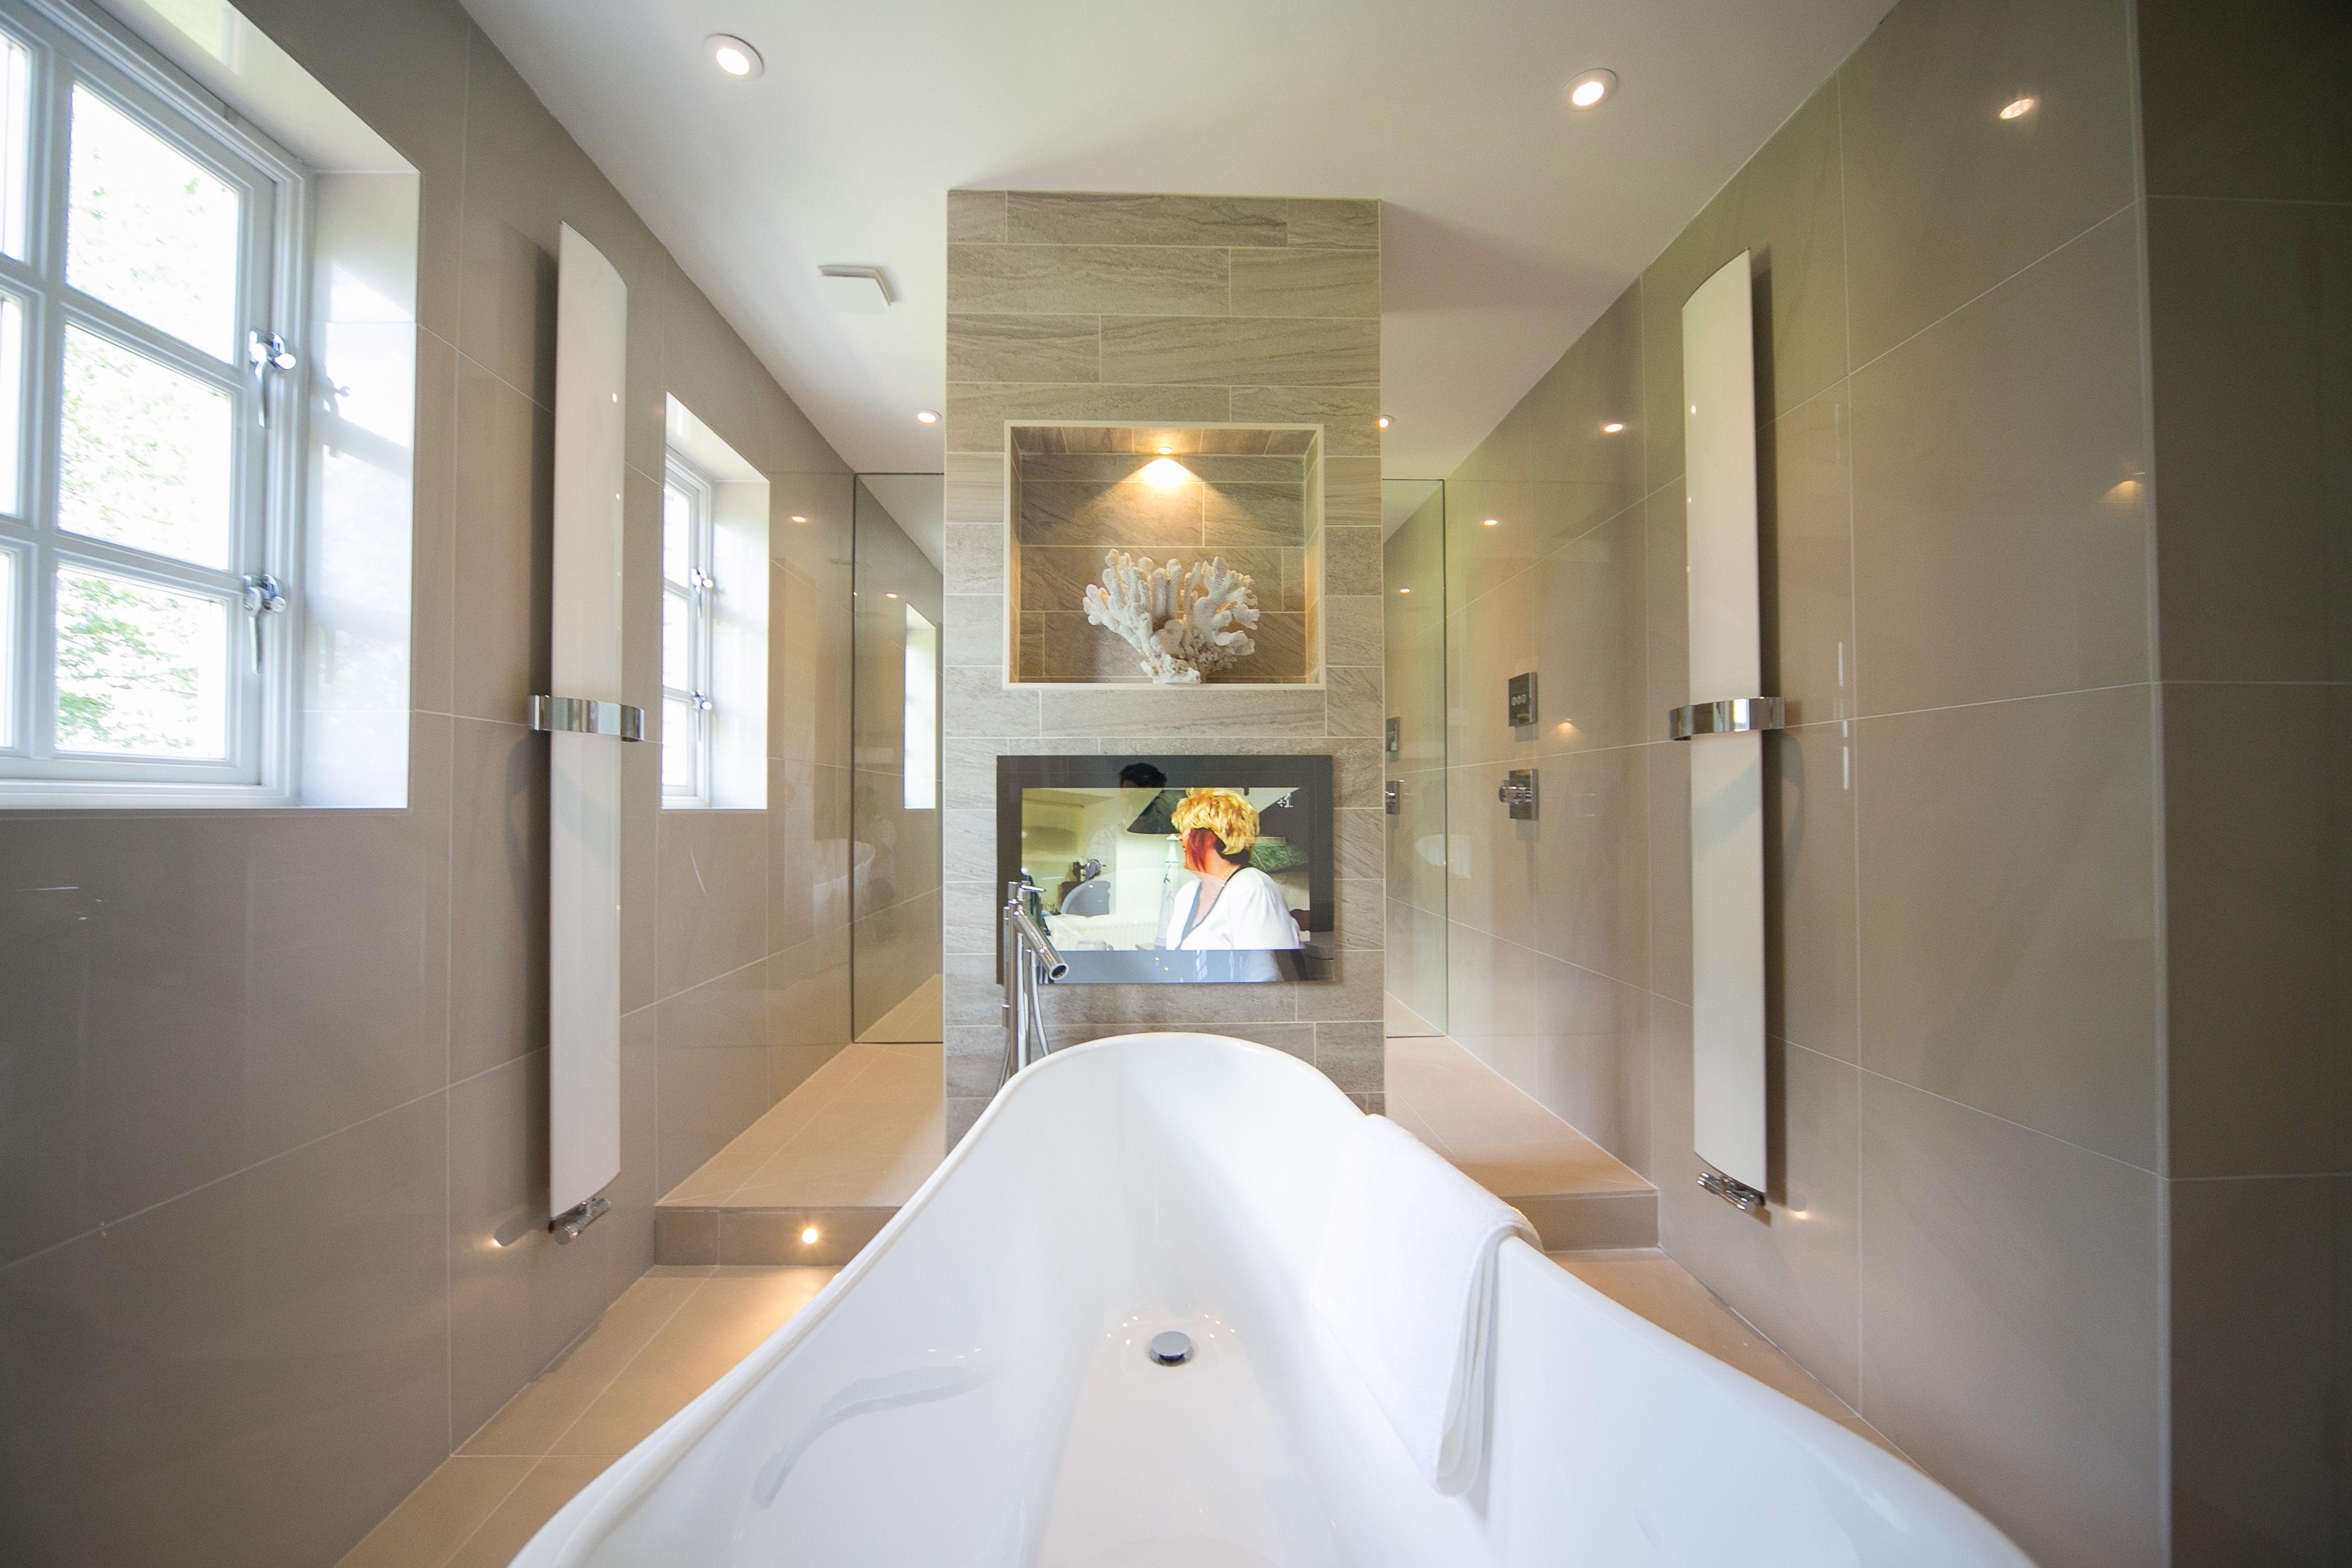 Award winning bathroom design project by one of our designers #project #bathroom #bathroomdesign #awardwinningbathroomdesign #interiordesign #interiors #design #interiordesign #home #homedecor #house